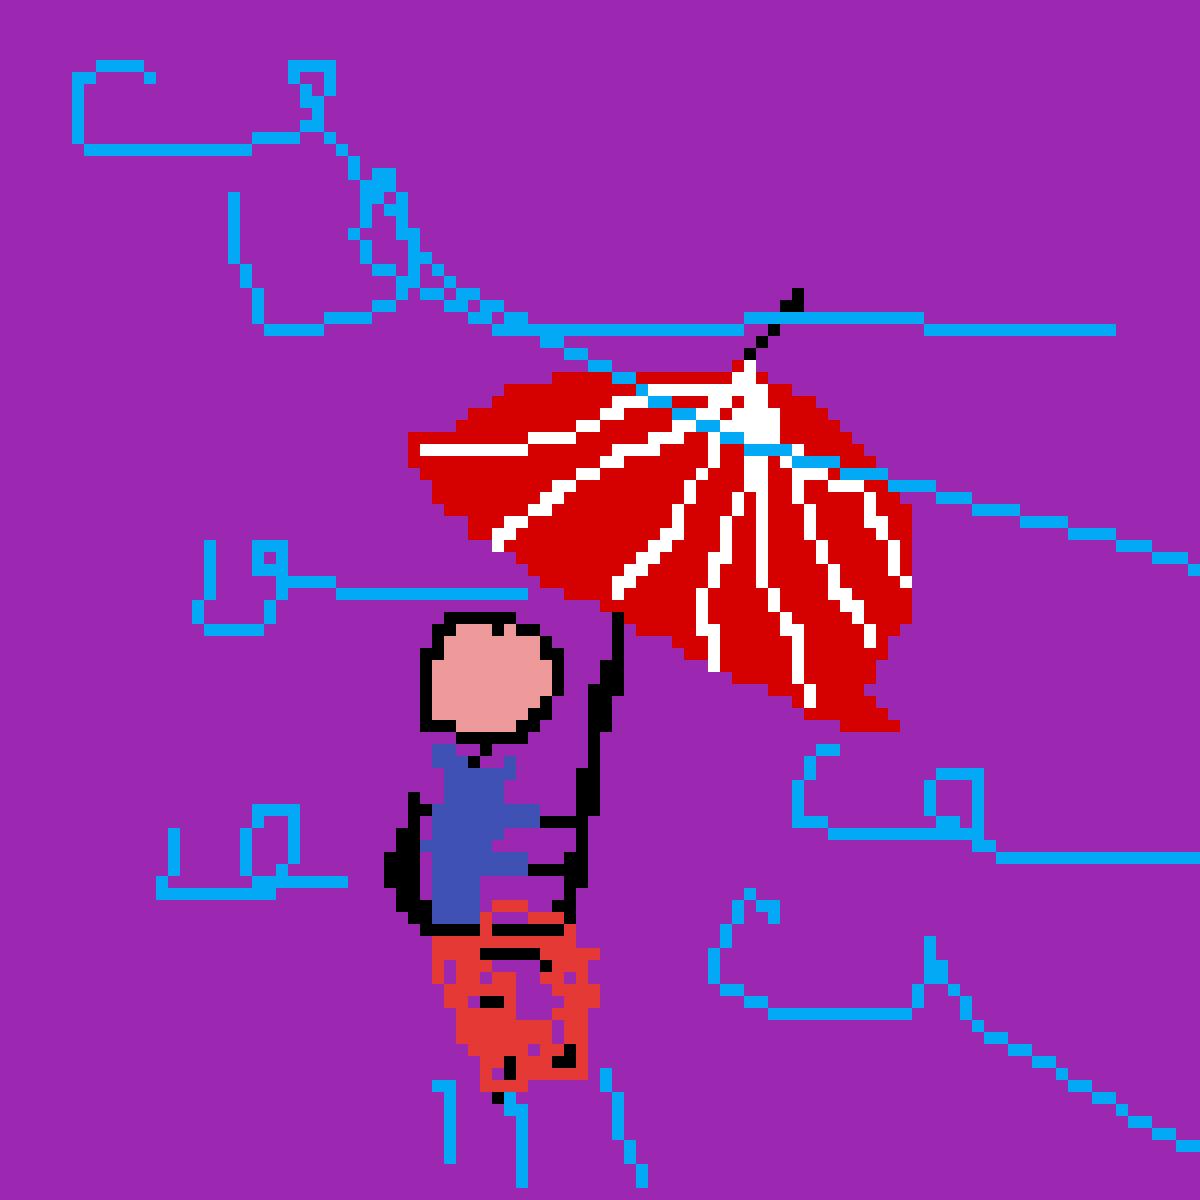 Challenge: windy by spongebobsqkat